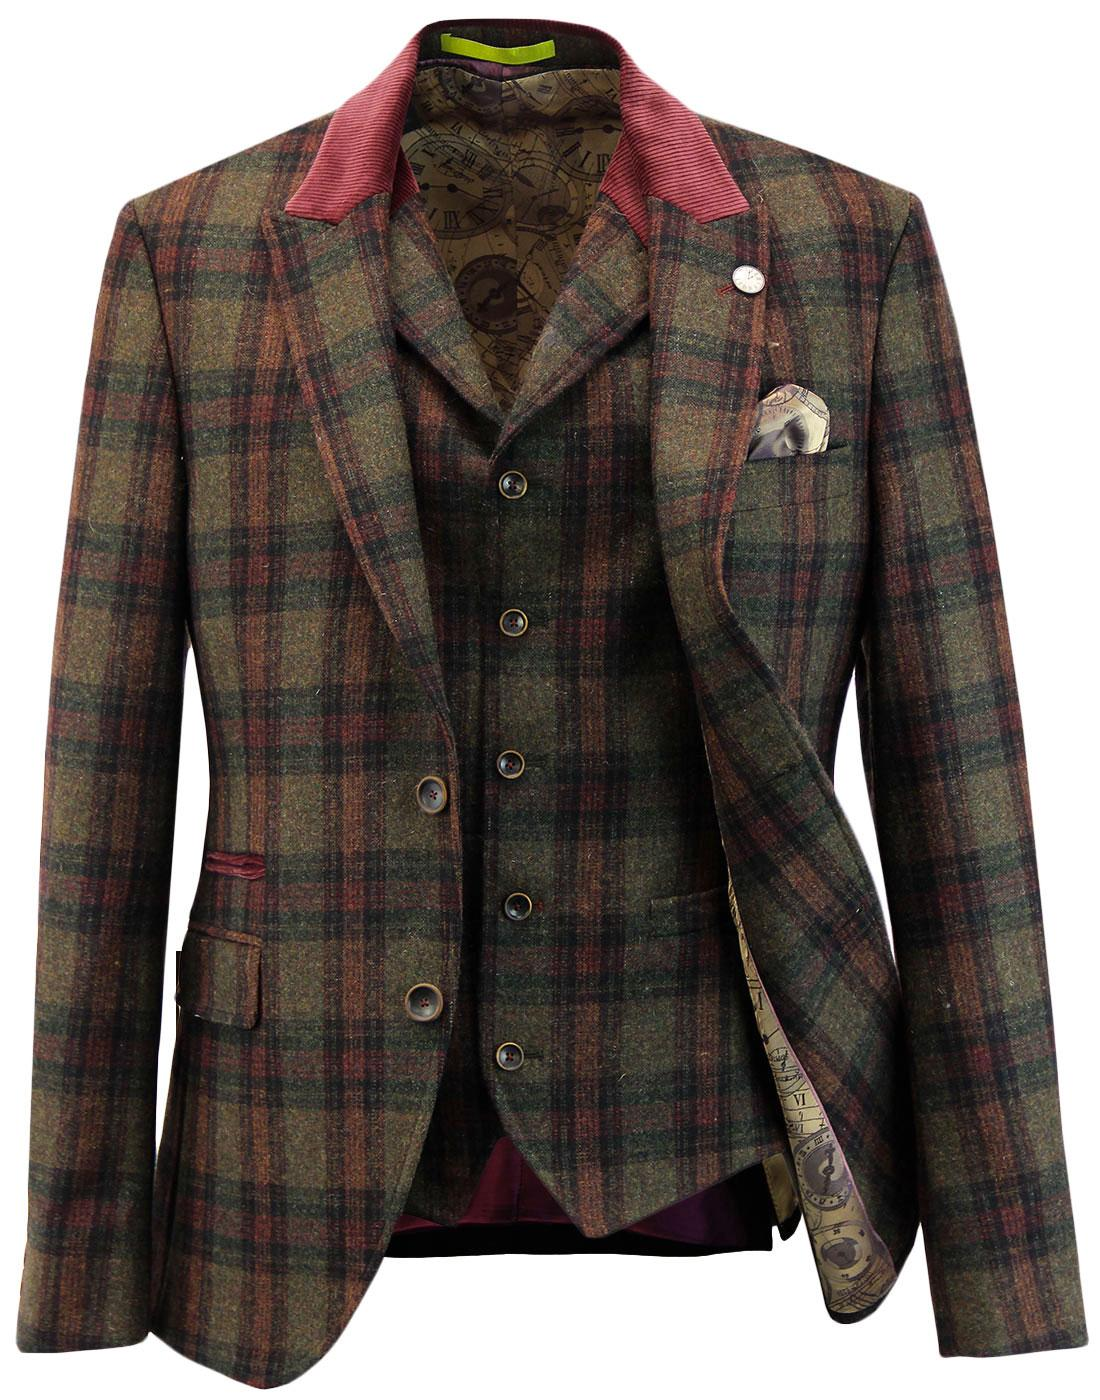 Temple GIBSON LONDON Matching Blazer & Waistcoat